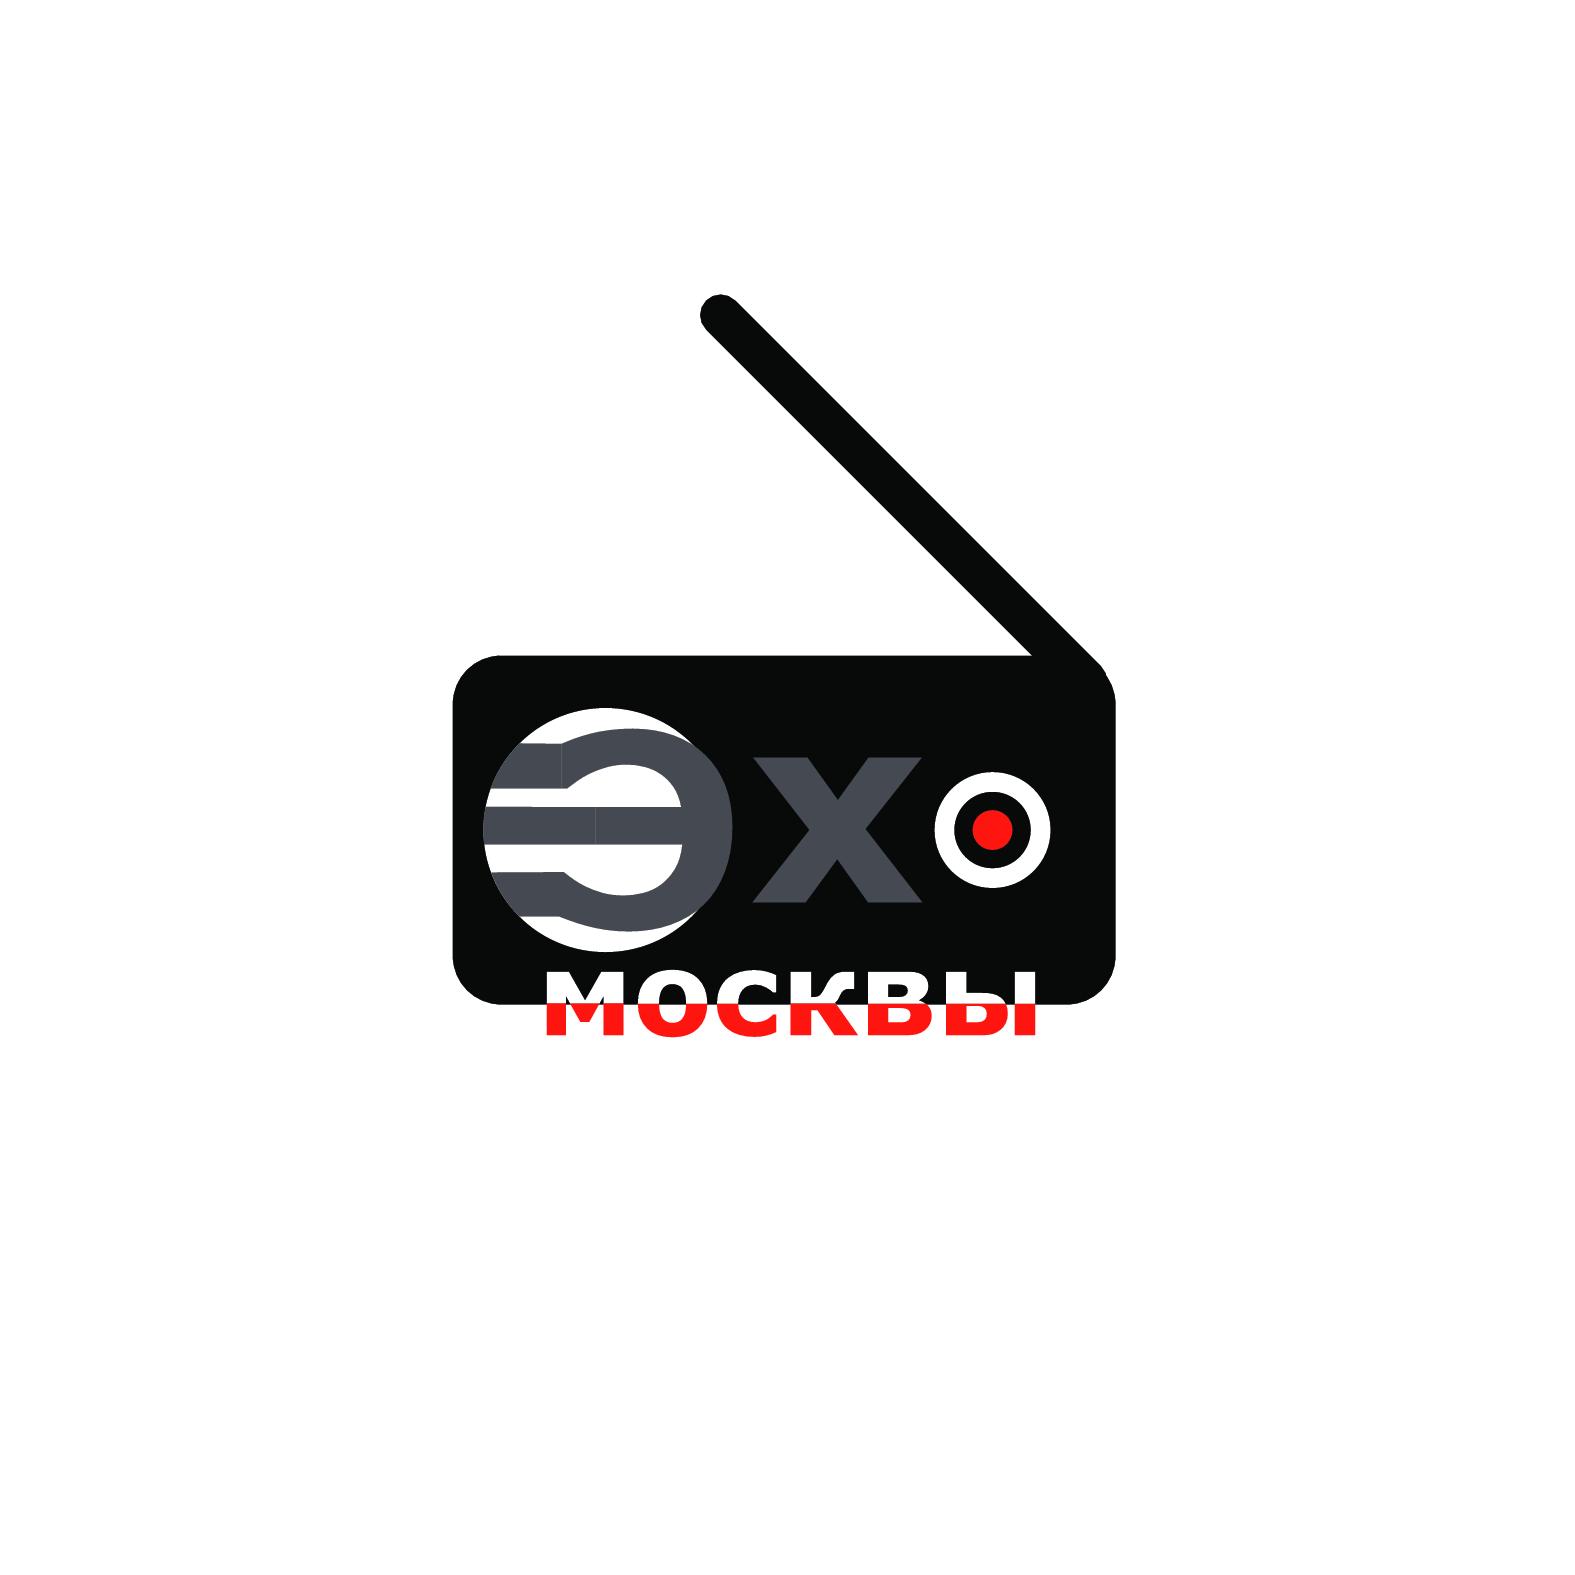 Дизайн логотипа р/с Эхо Москвы. фото f_4515622a94edf20c.png